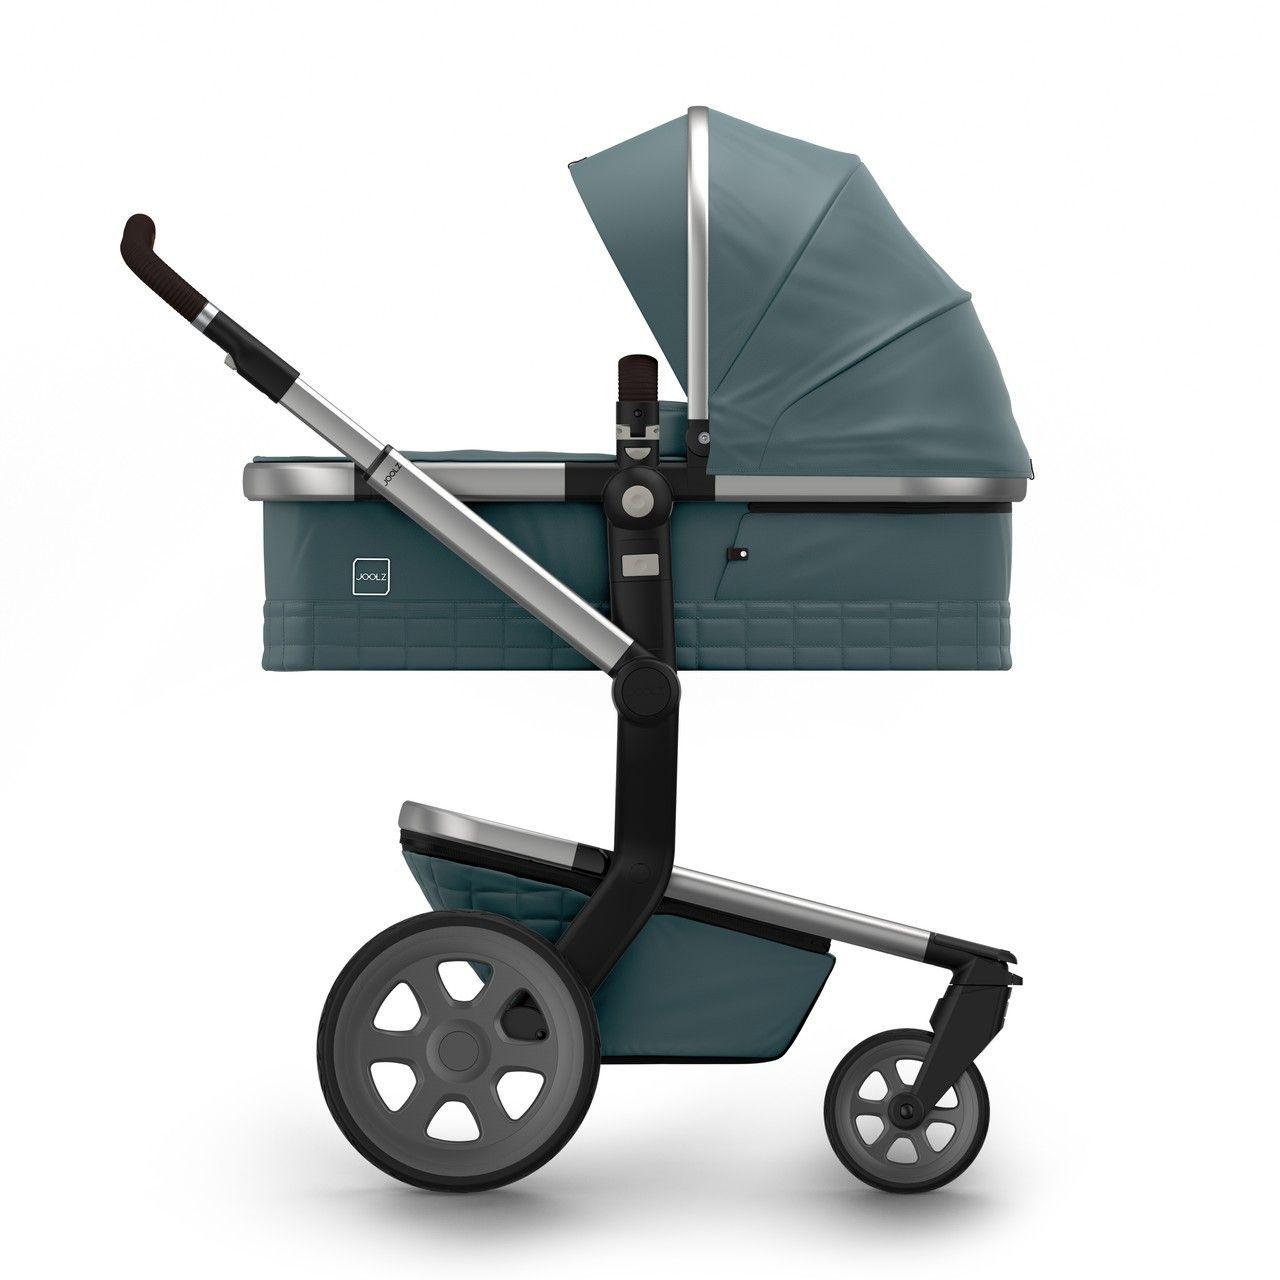 kinderwagen set s joolz day 2 quadro kleine fabriek. Black Bedroom Furniture Sets. Home Design Ideas